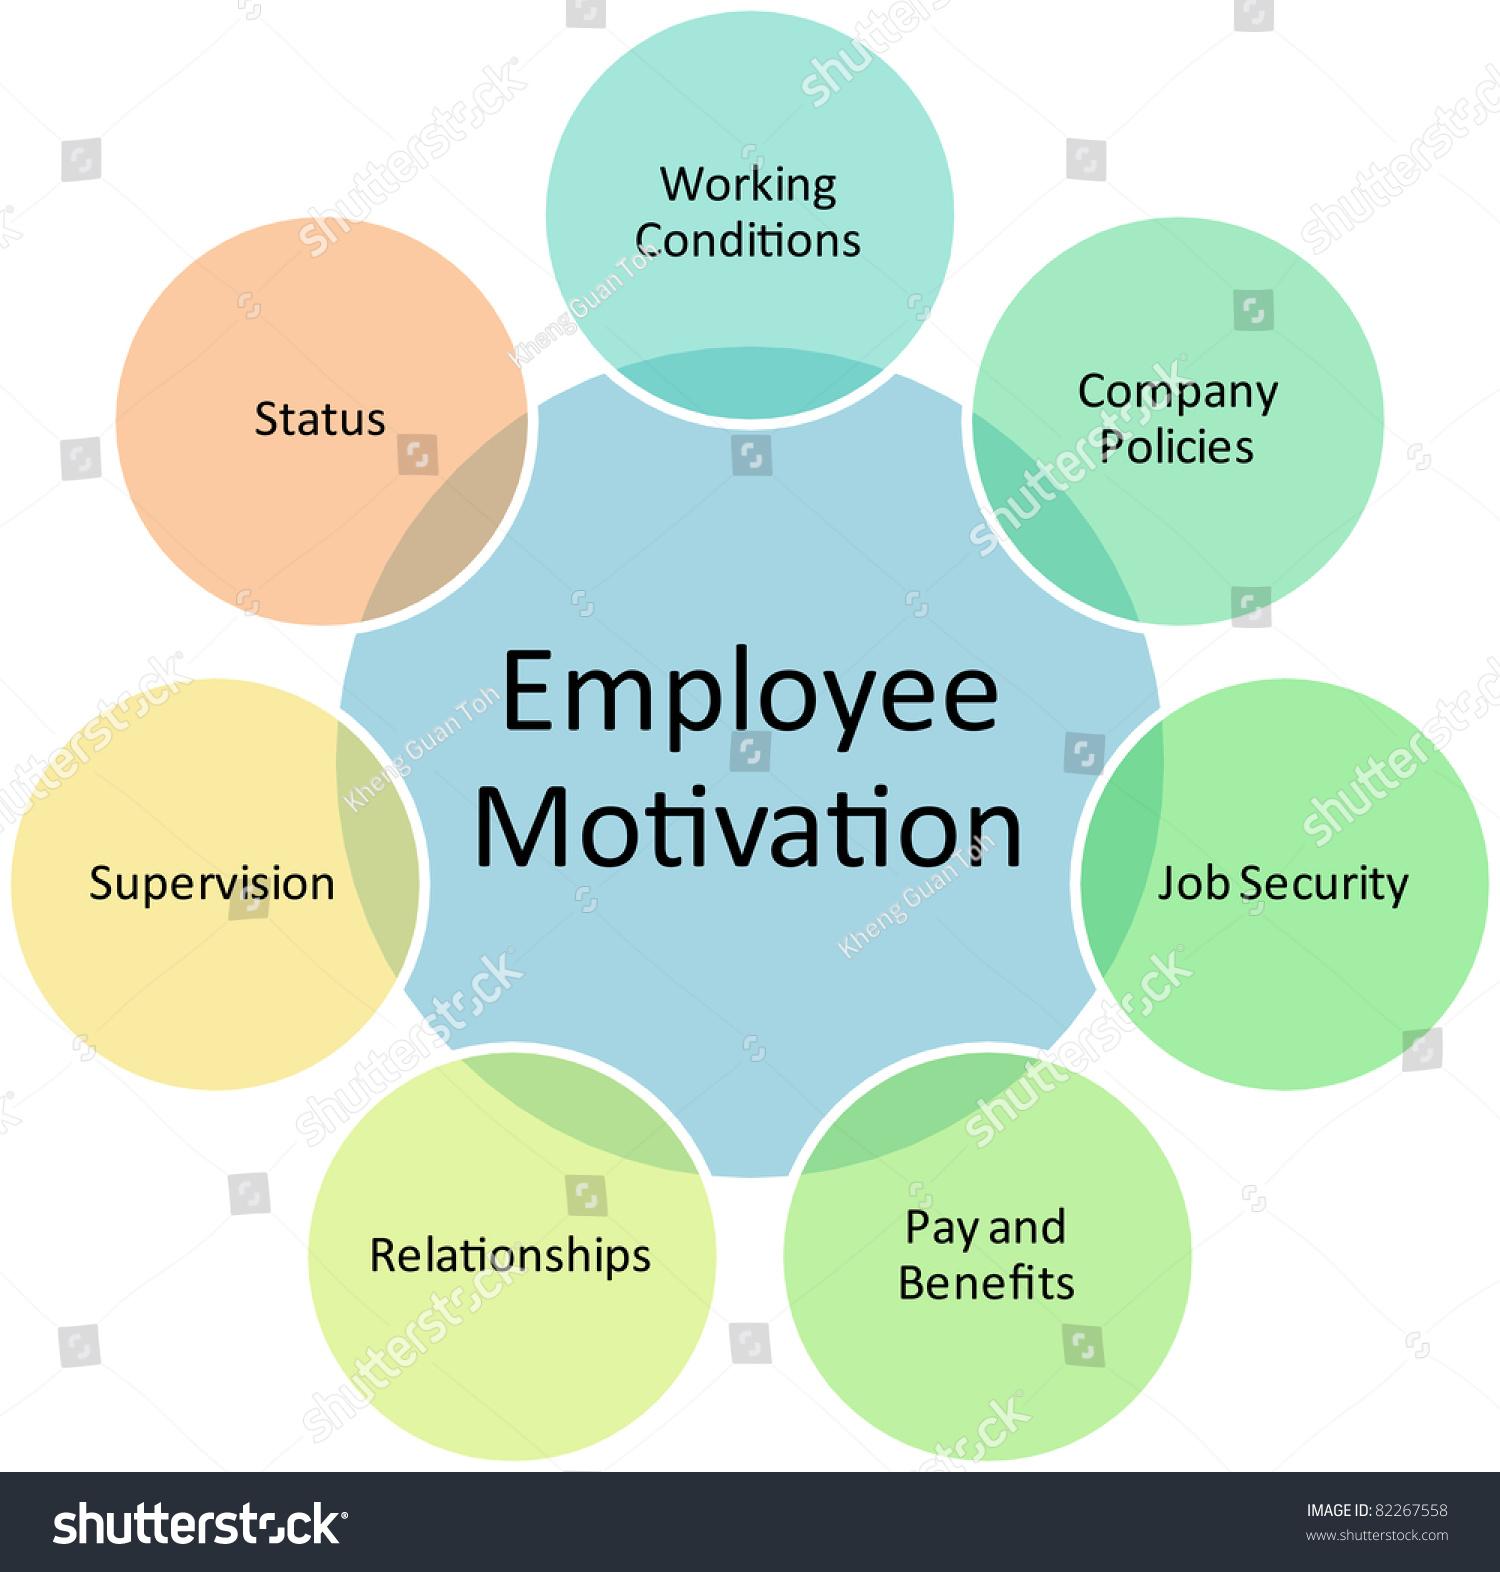 Three Major Theories of Motivation